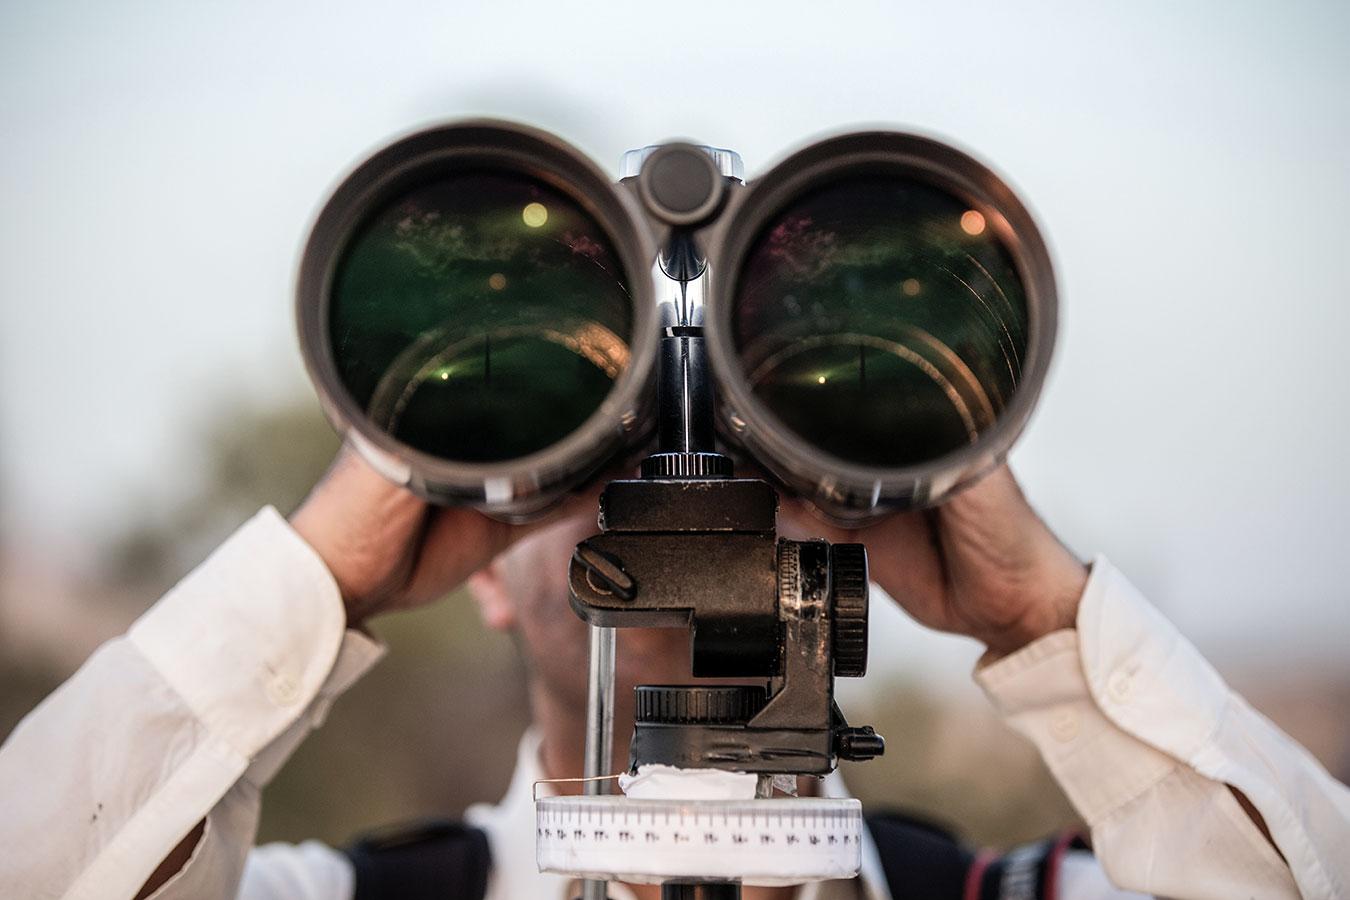 hu-nogradi-gyorgy-binoculars.jpg